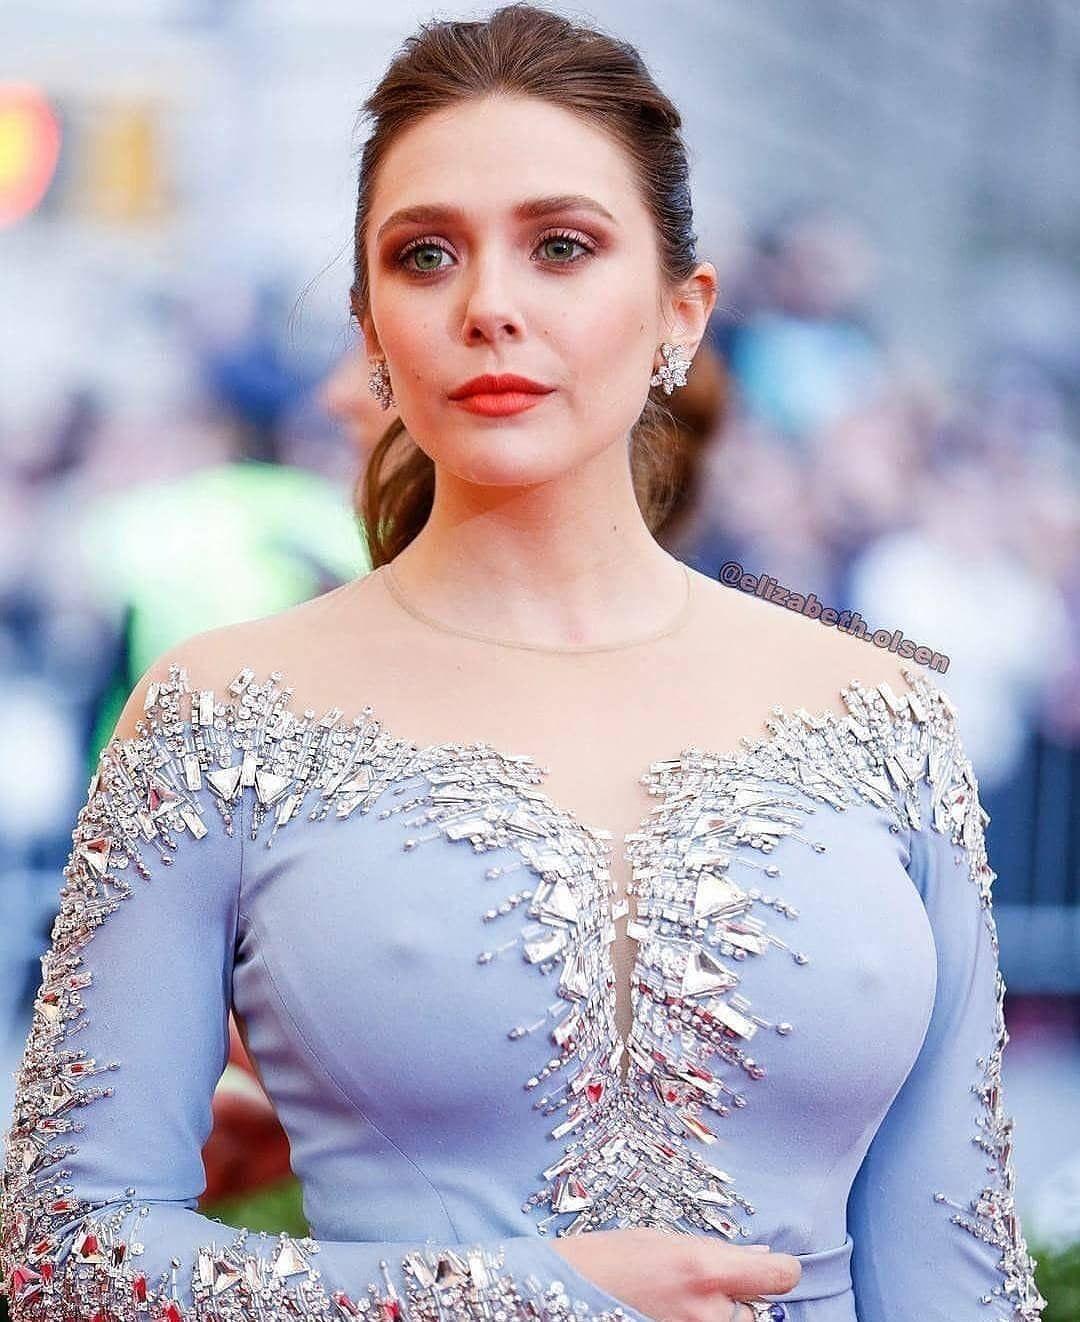 Elizabeth Olsen On Instagram In 2020 Elizabeth Olsen Bikini Elizabeth Olsen Scarlet Witch Elizabeth Olsen